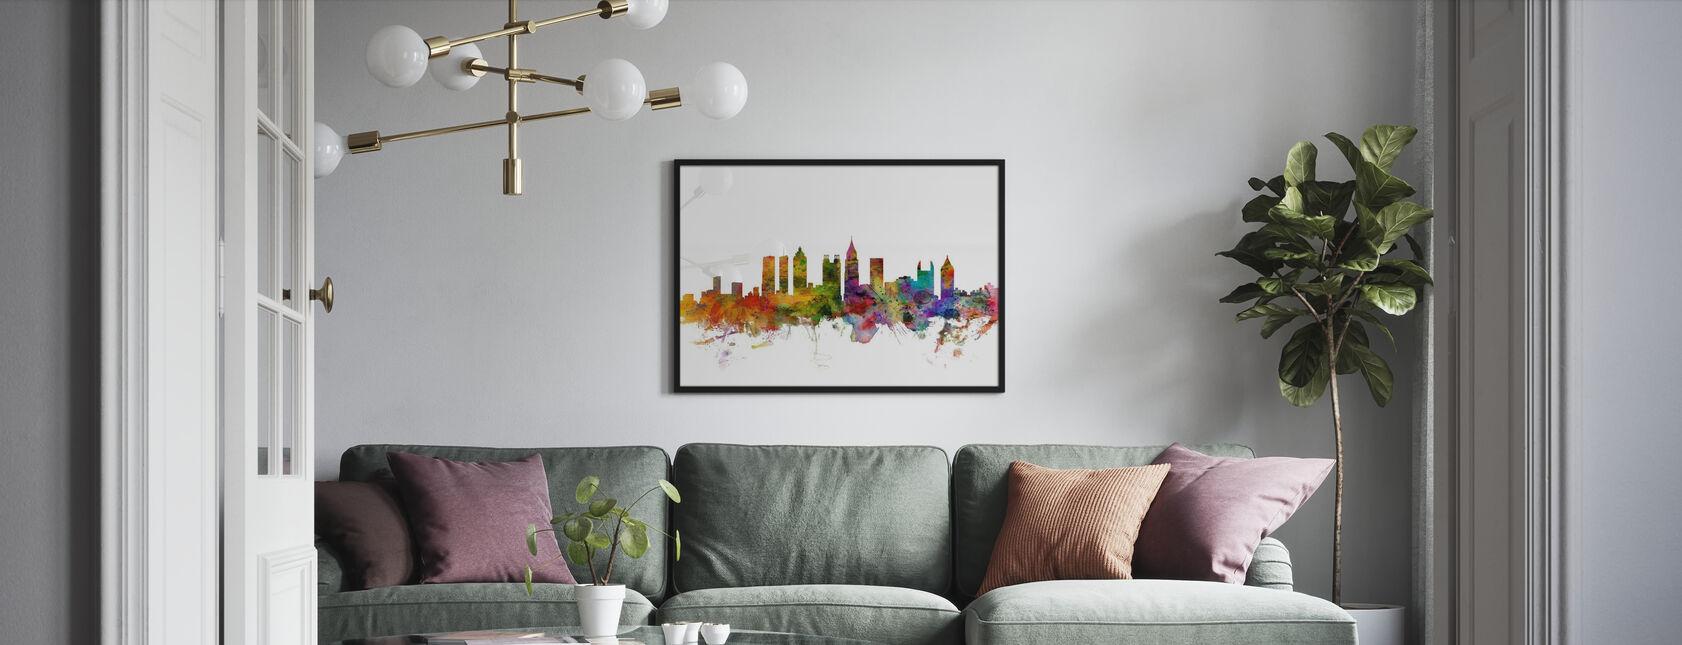 Atlanta Georgia Skyline - Plakat - Stue